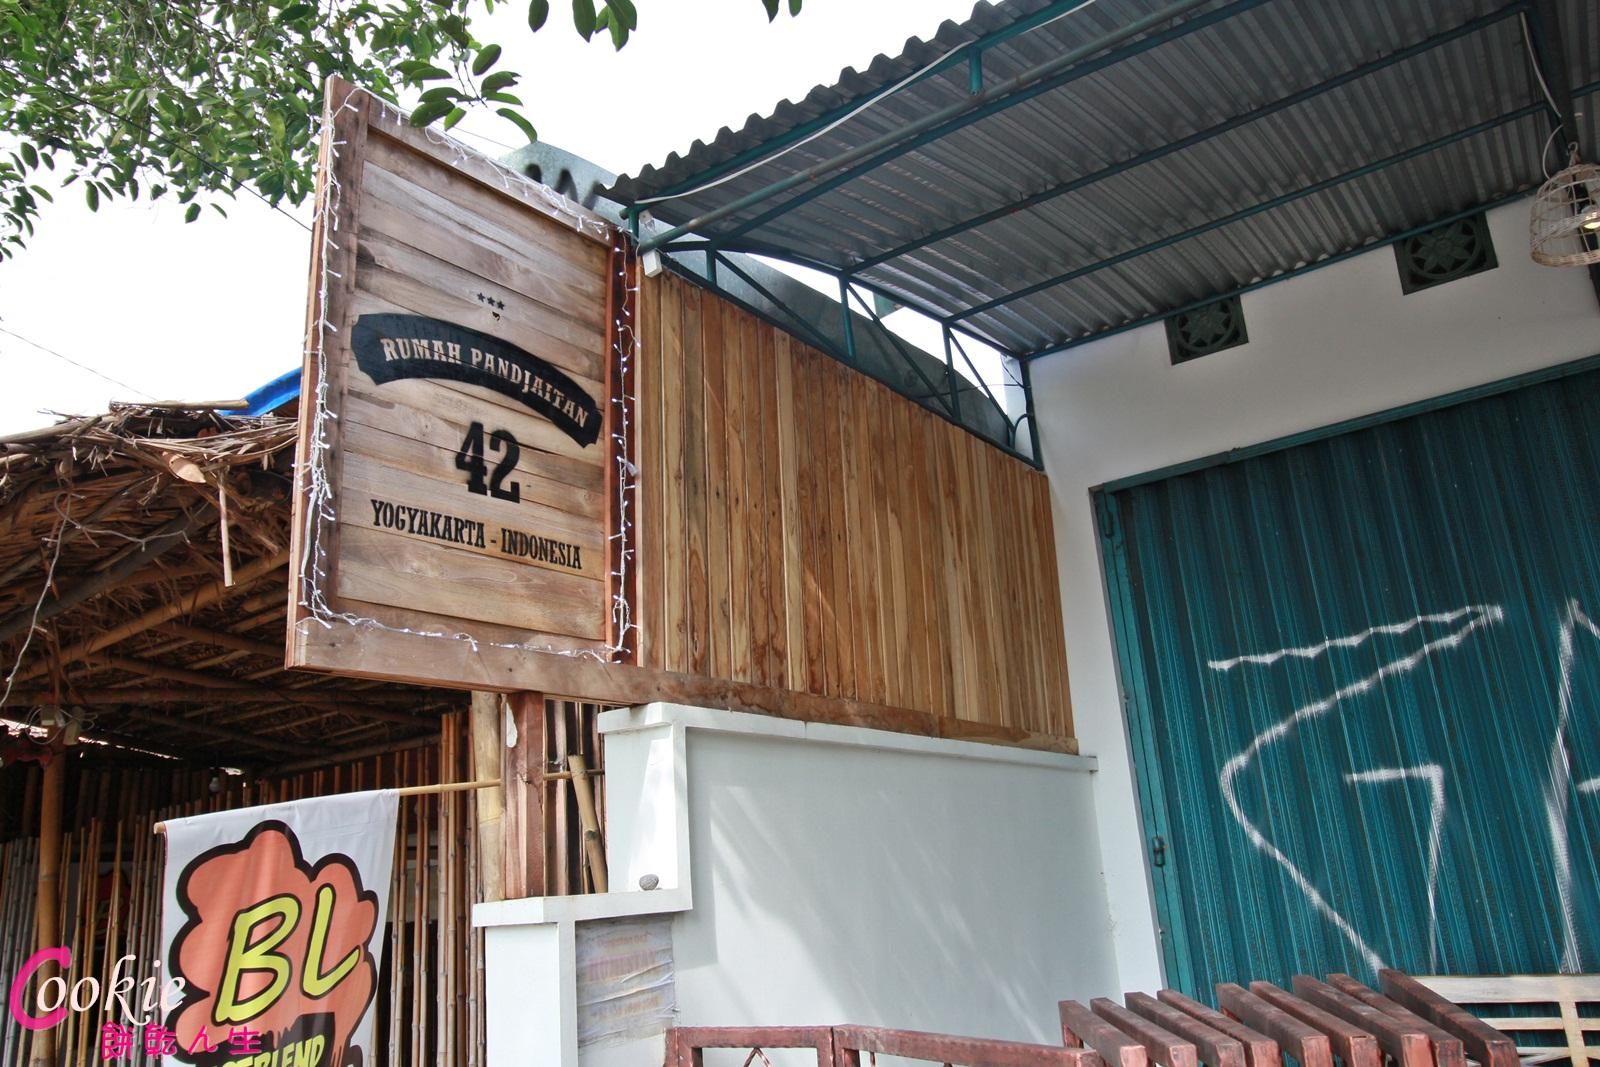 【Rumah Panjaitan】日惹青年旅館Yogyakarta Hostel,超美的交誼廳 @ 餅乾人生Cookie Life :: 痞客邦